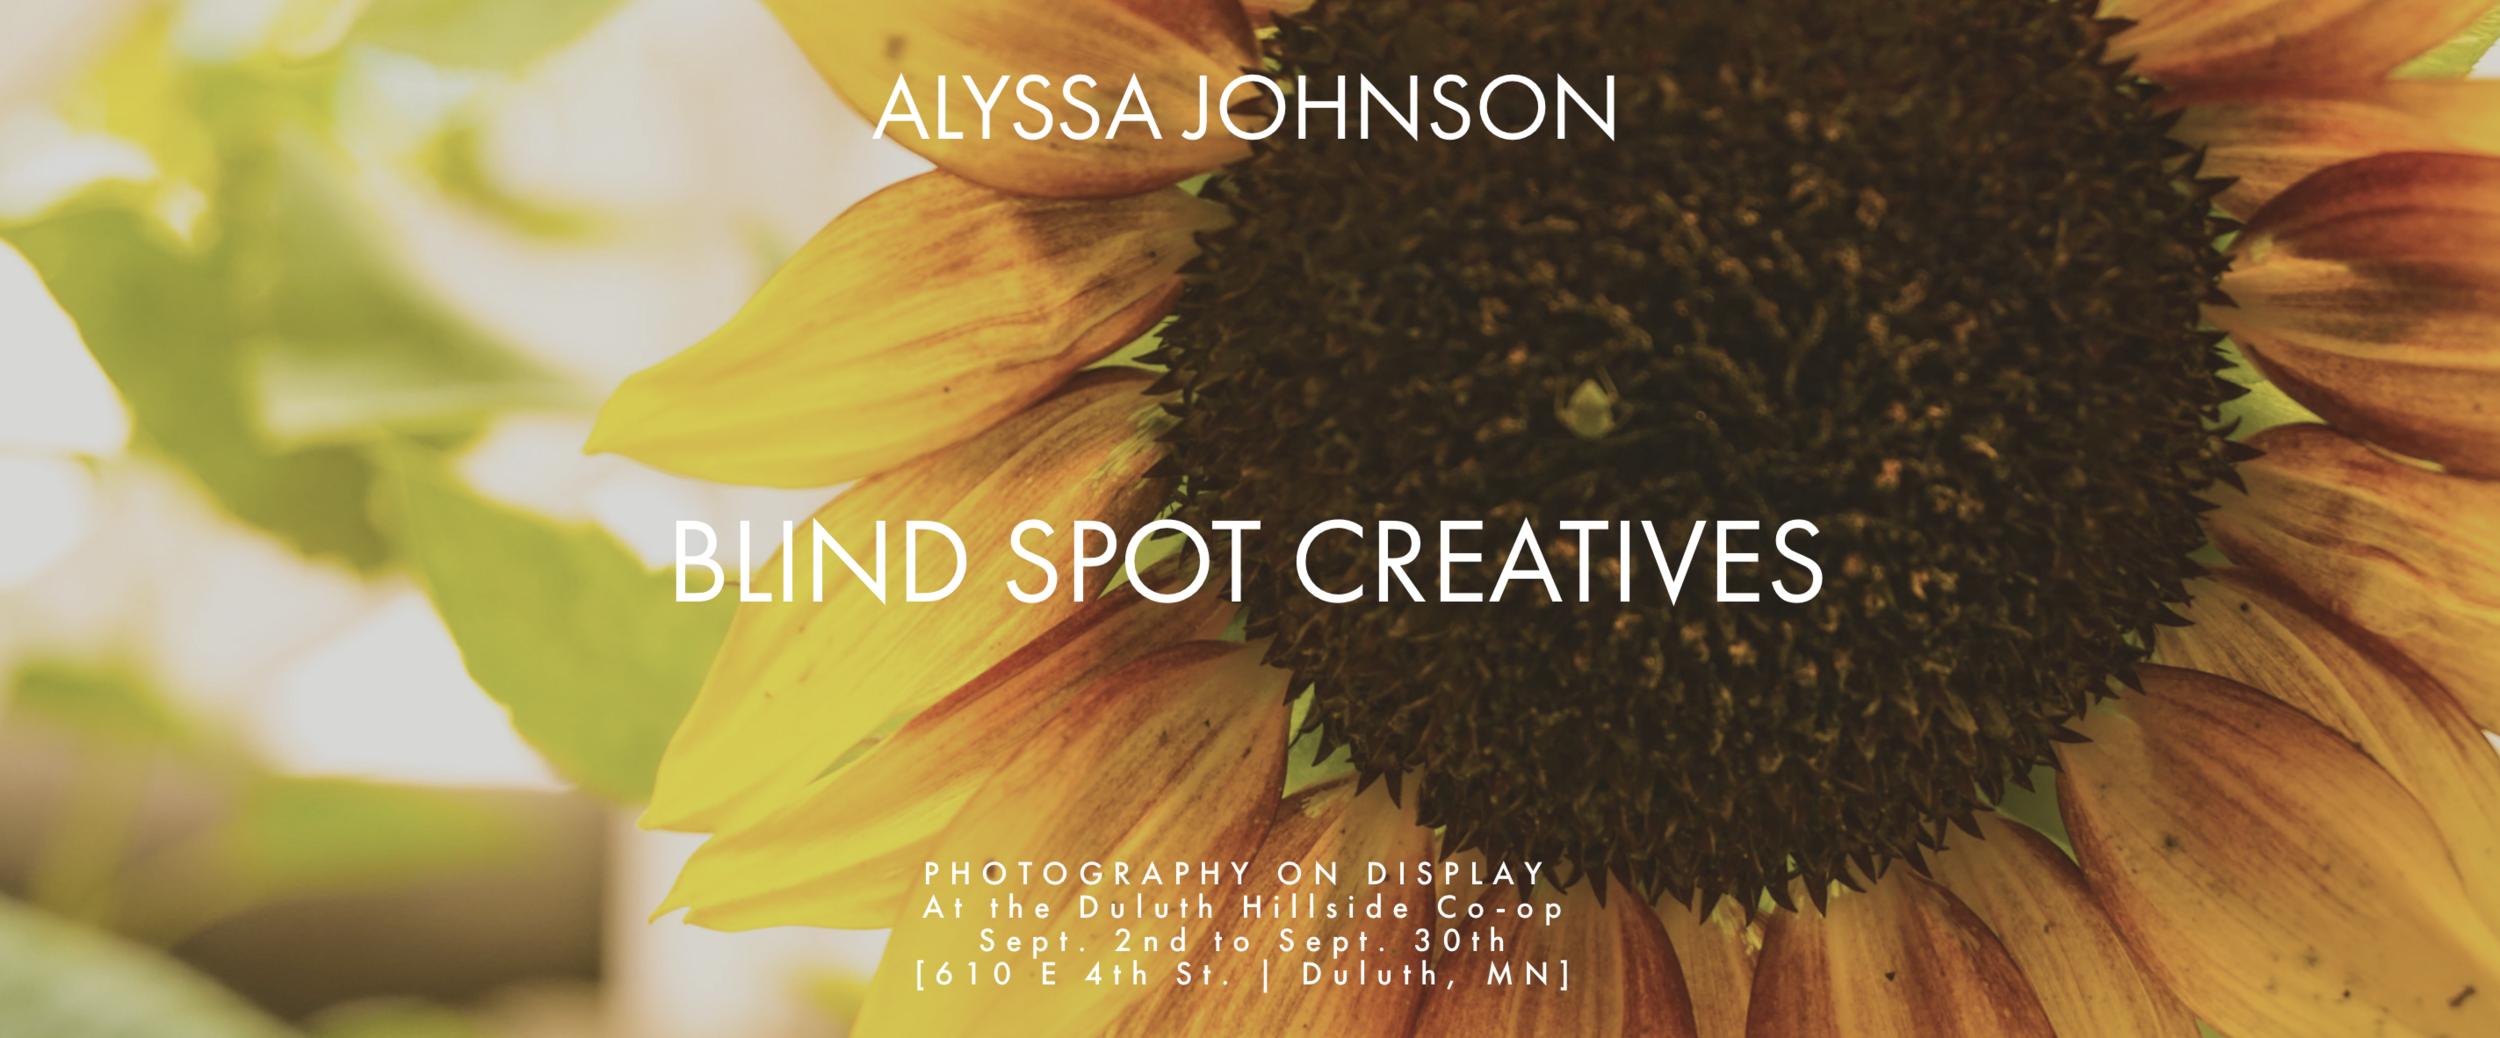 Whole Foods Co-op Duluth Minnesota - Artist & Photographer Alyssa Johnson- On Display - September 2019